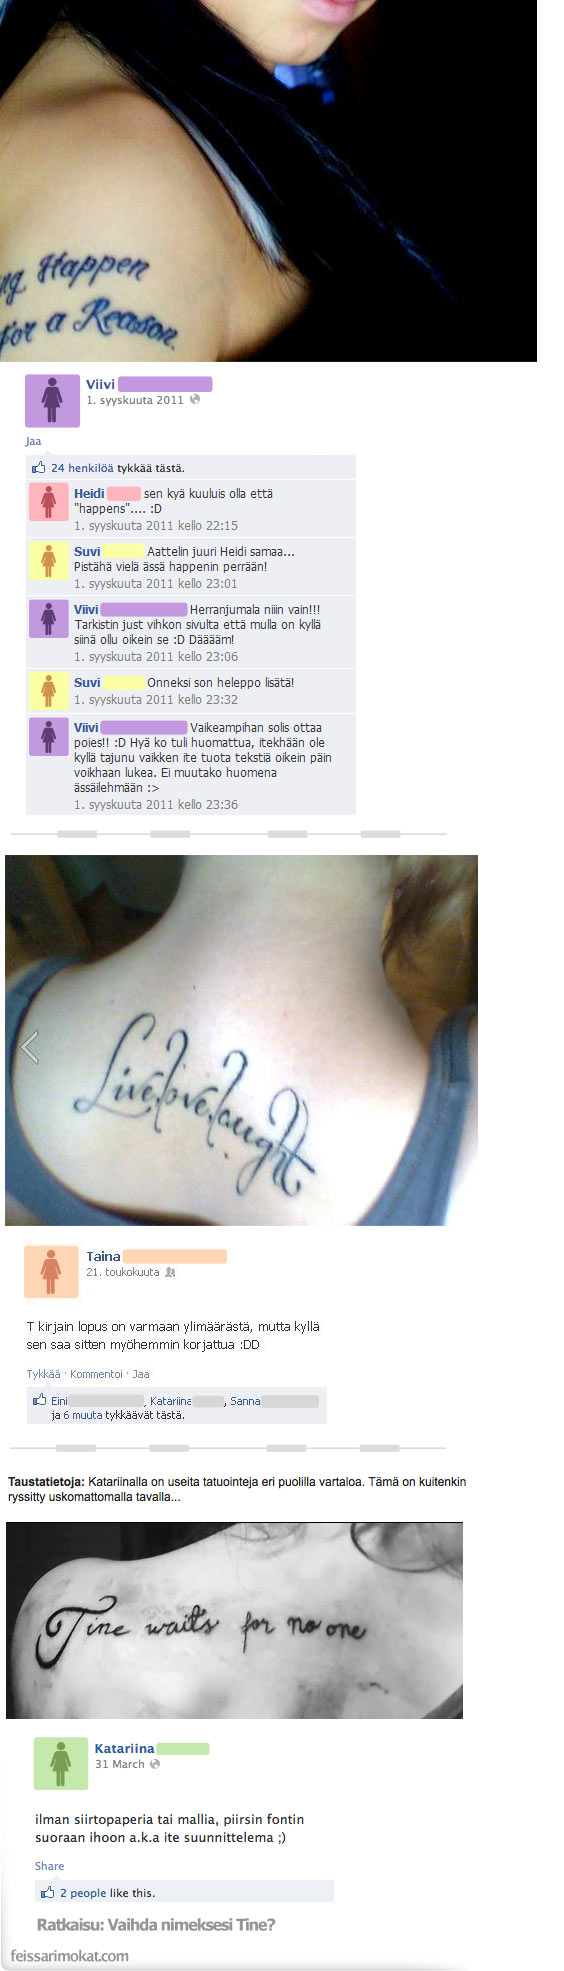 Tatuointimokia